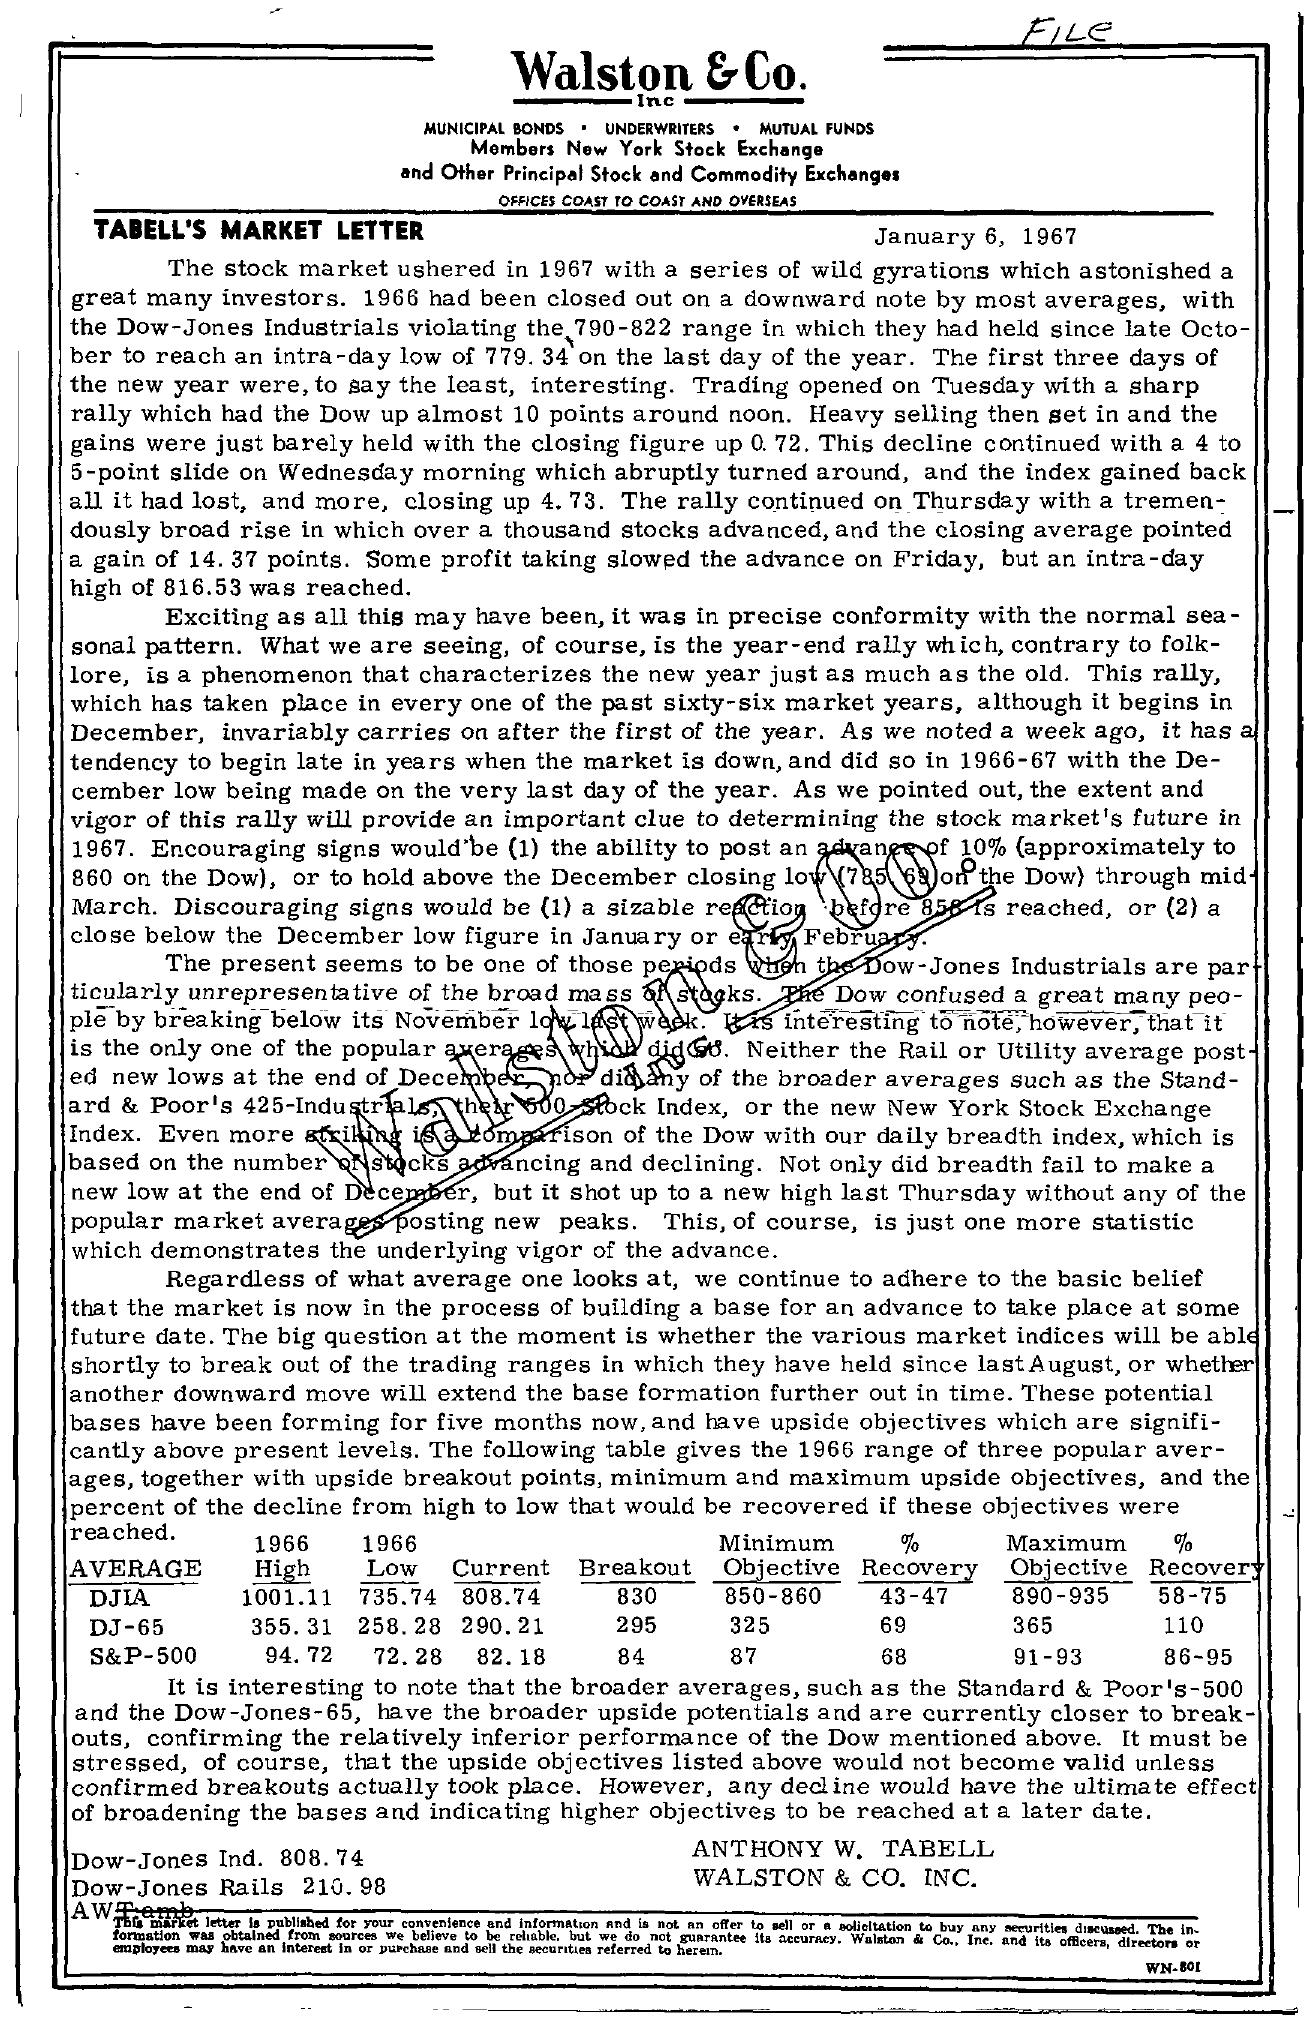 Tabell's Market Letter - January 06, 1967